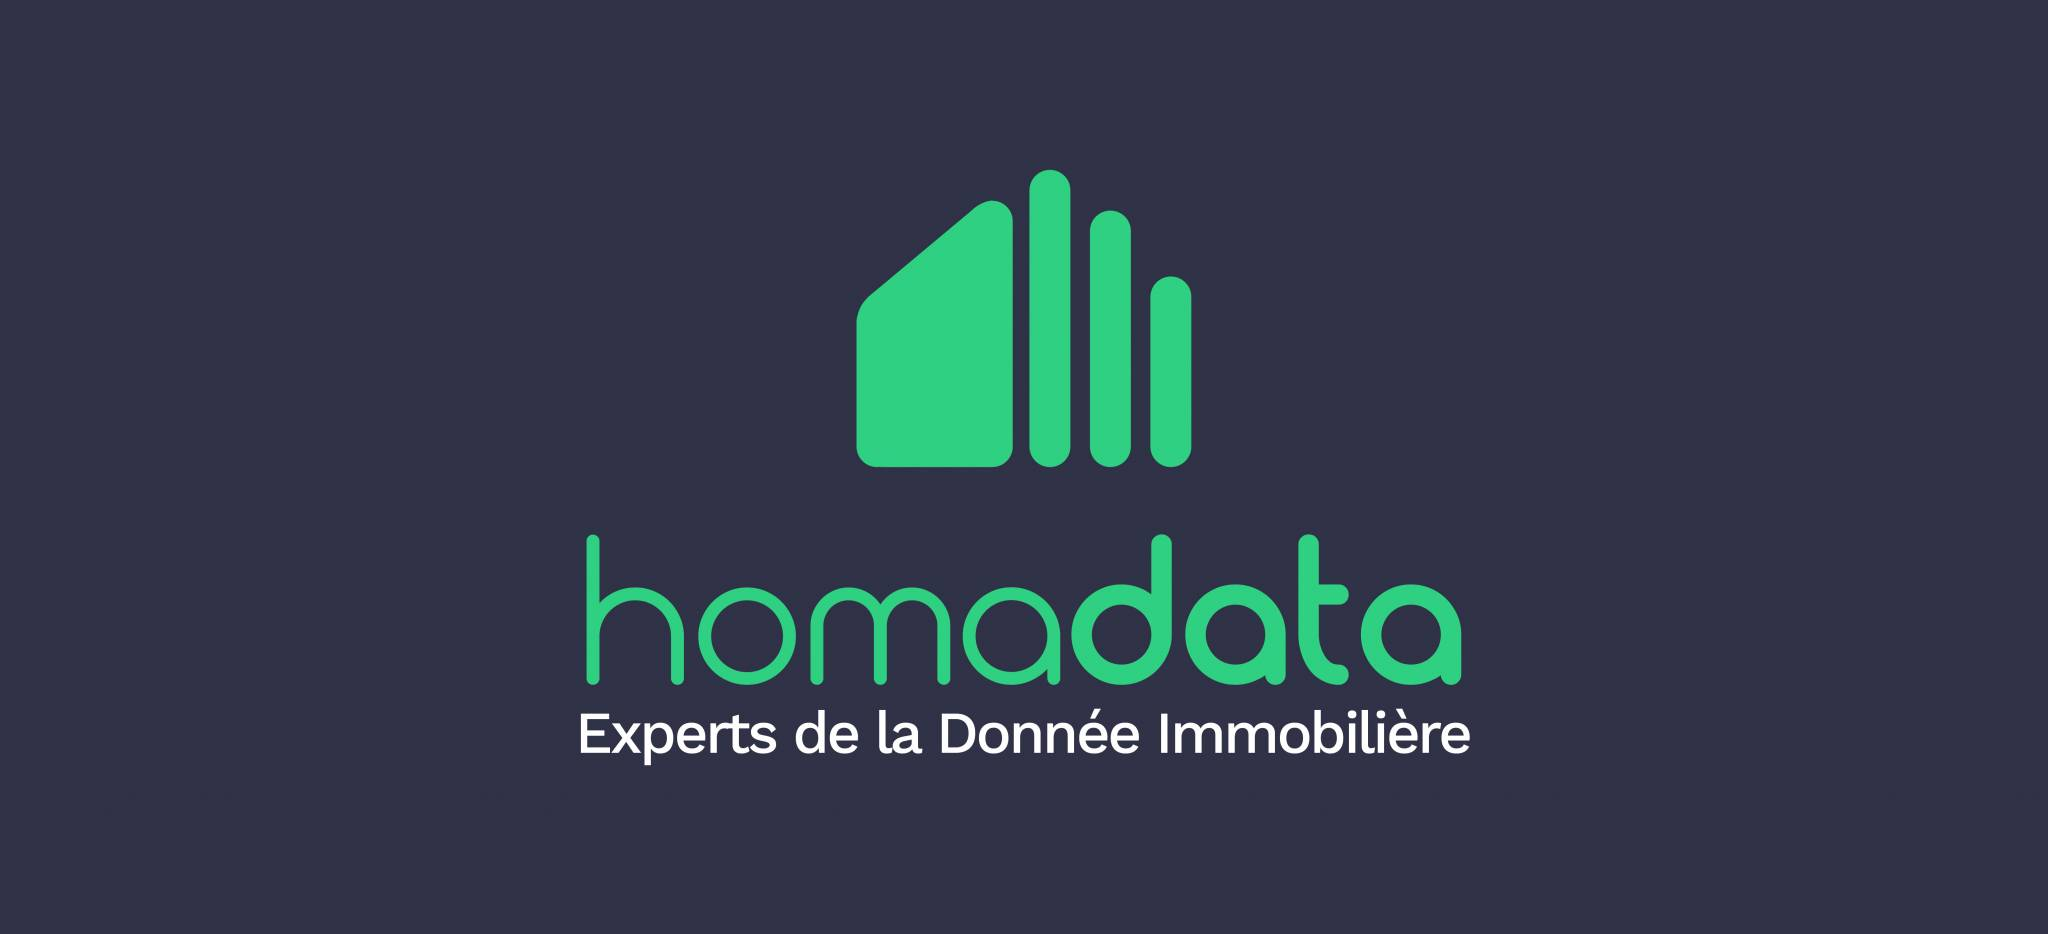 Logo Homadata